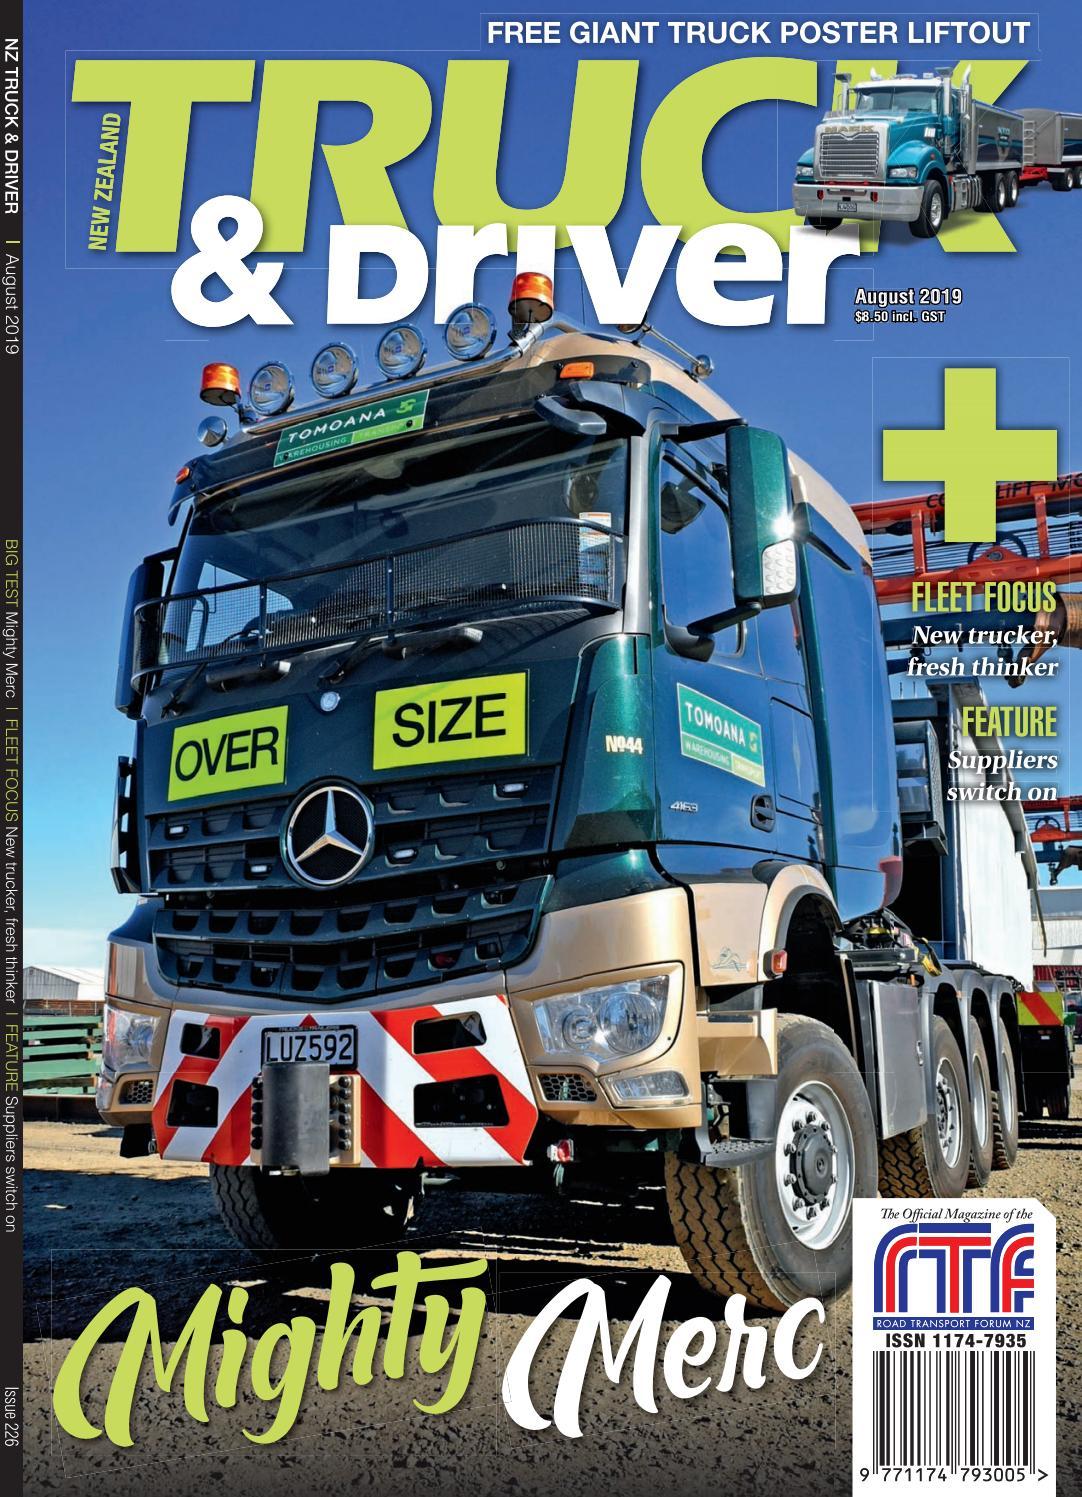 NZ Truck & Driver August 2019 by NZ Truck & Driver - issuu